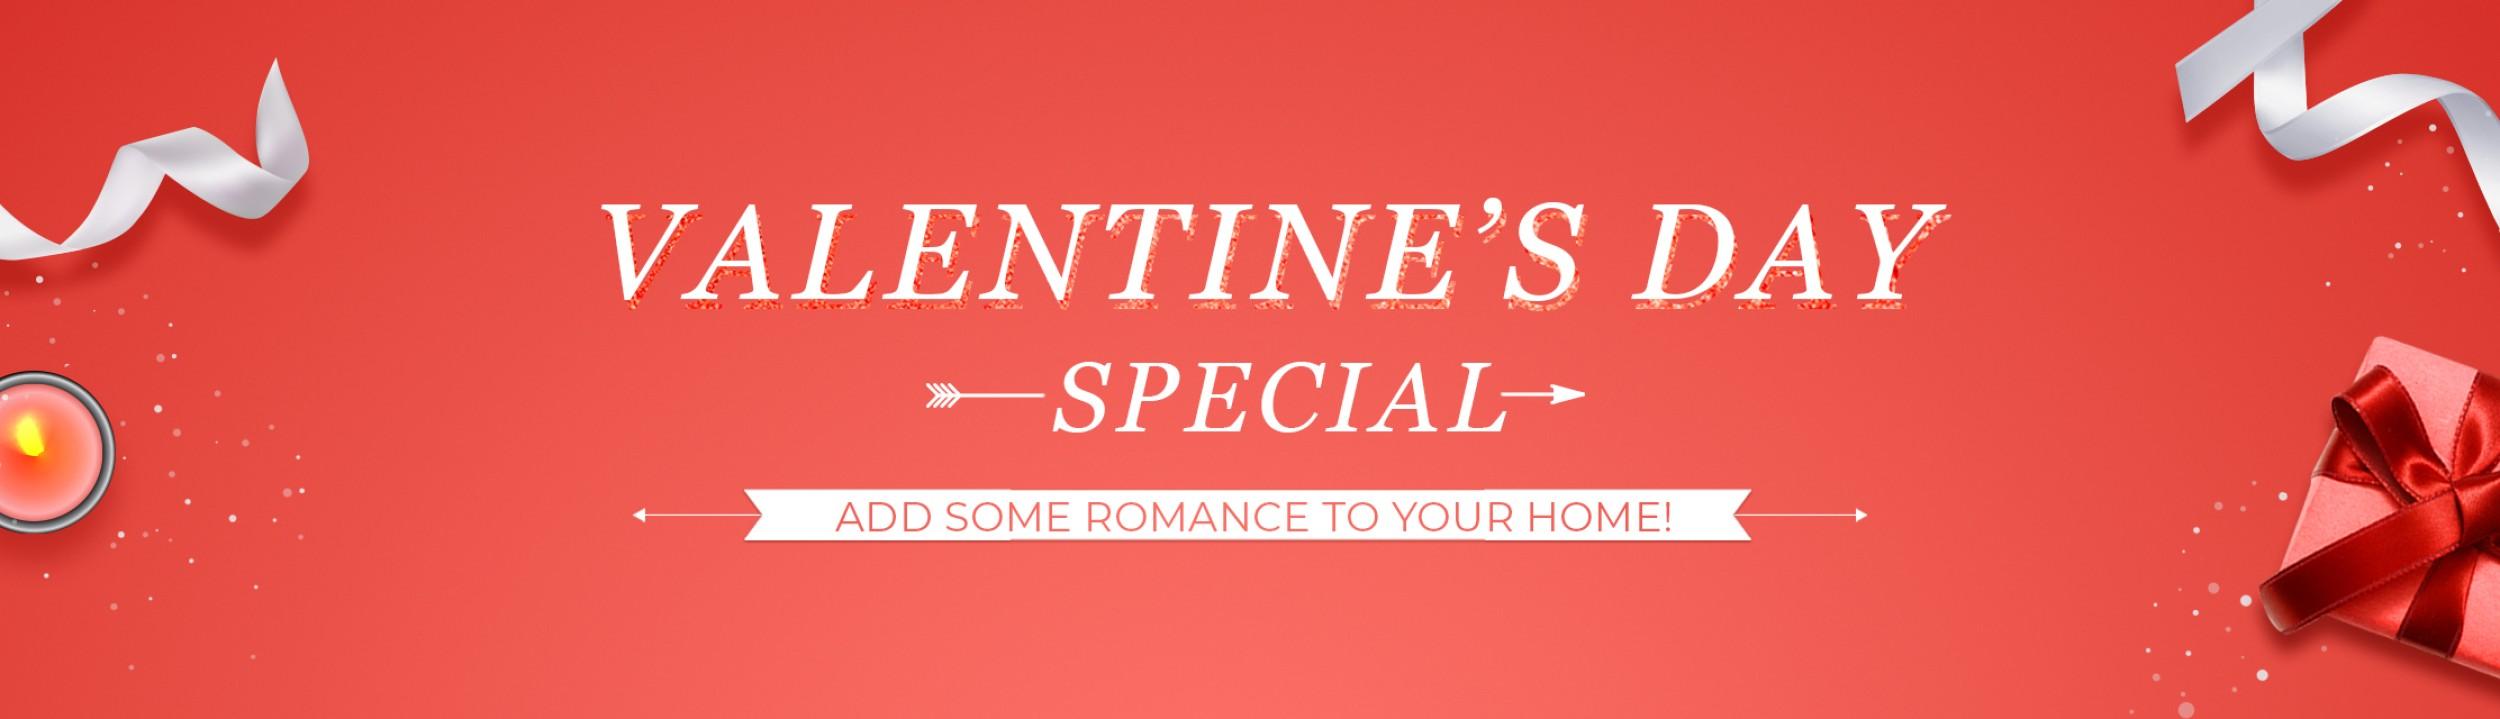 Gift For Her & Valentine Gifts Online | Valentines Day Gift Ideas | Valentineu0027s Day ...